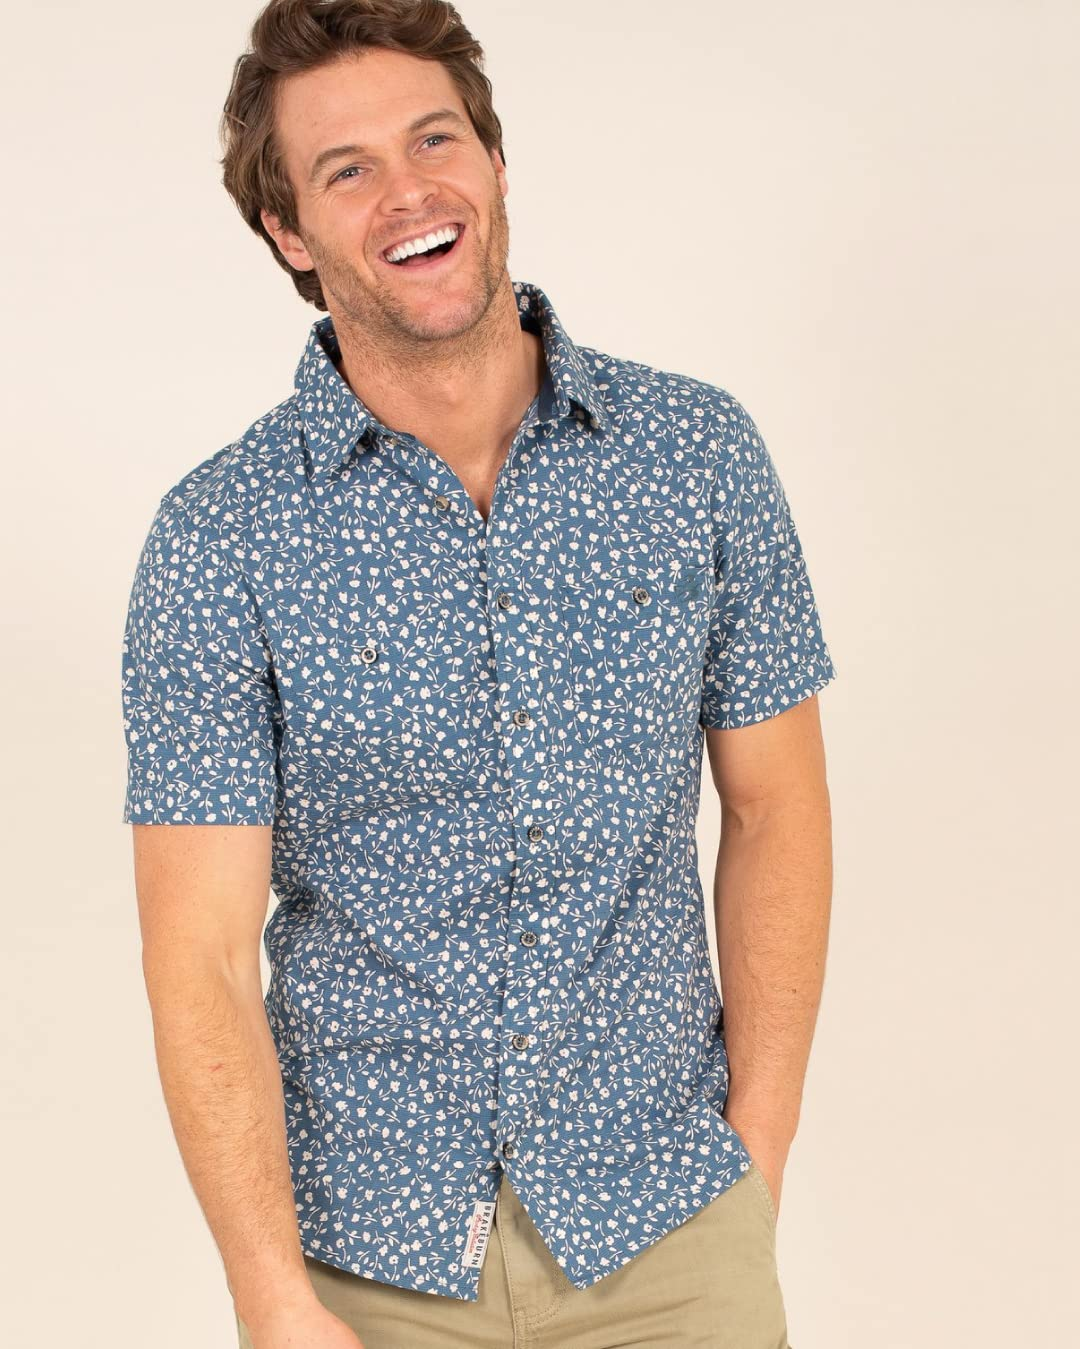 Jolla Navy Shirt Griggs